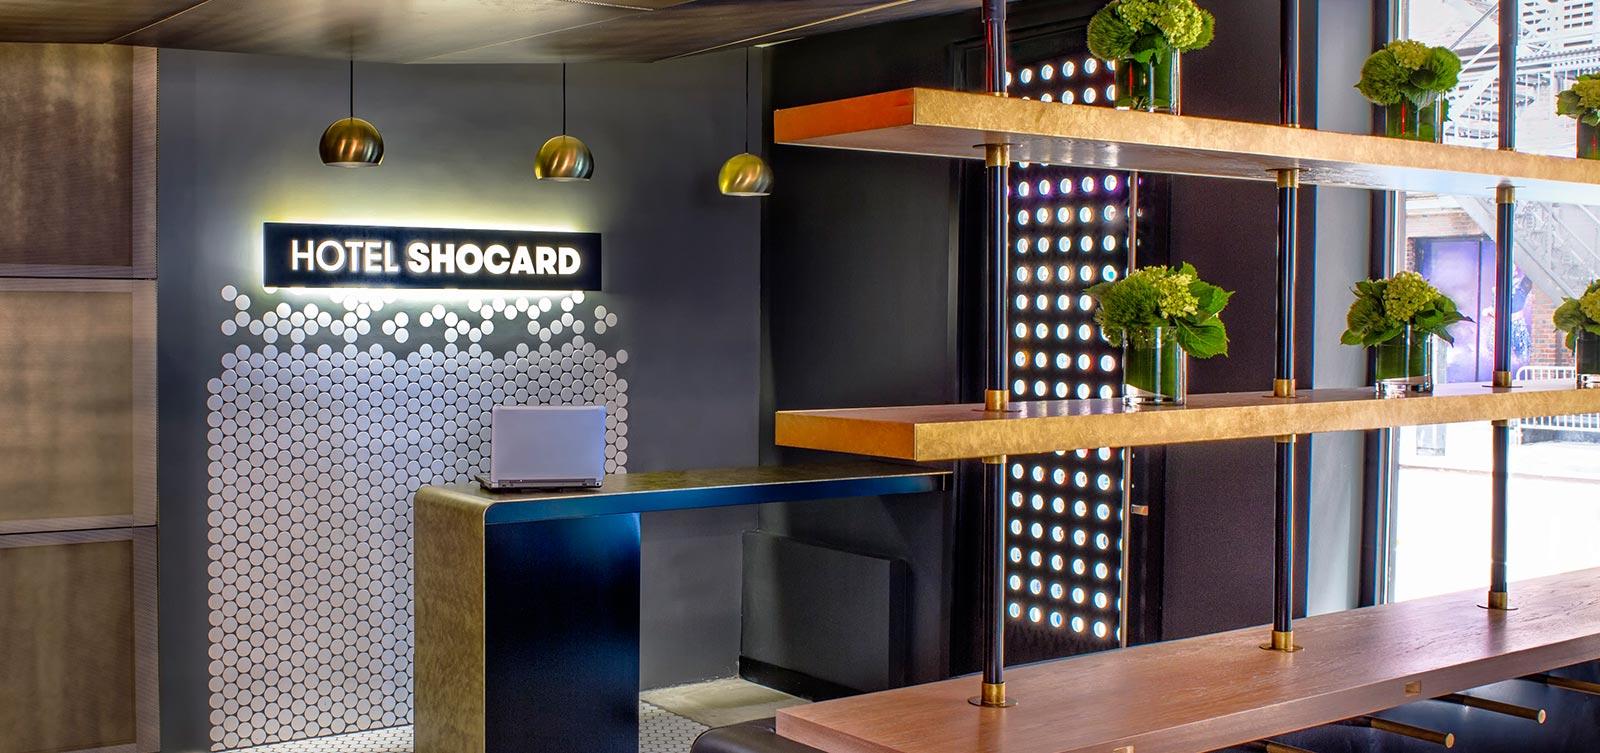 Hospitality Funding Advises Hotel Shocard Acquisition.jpg